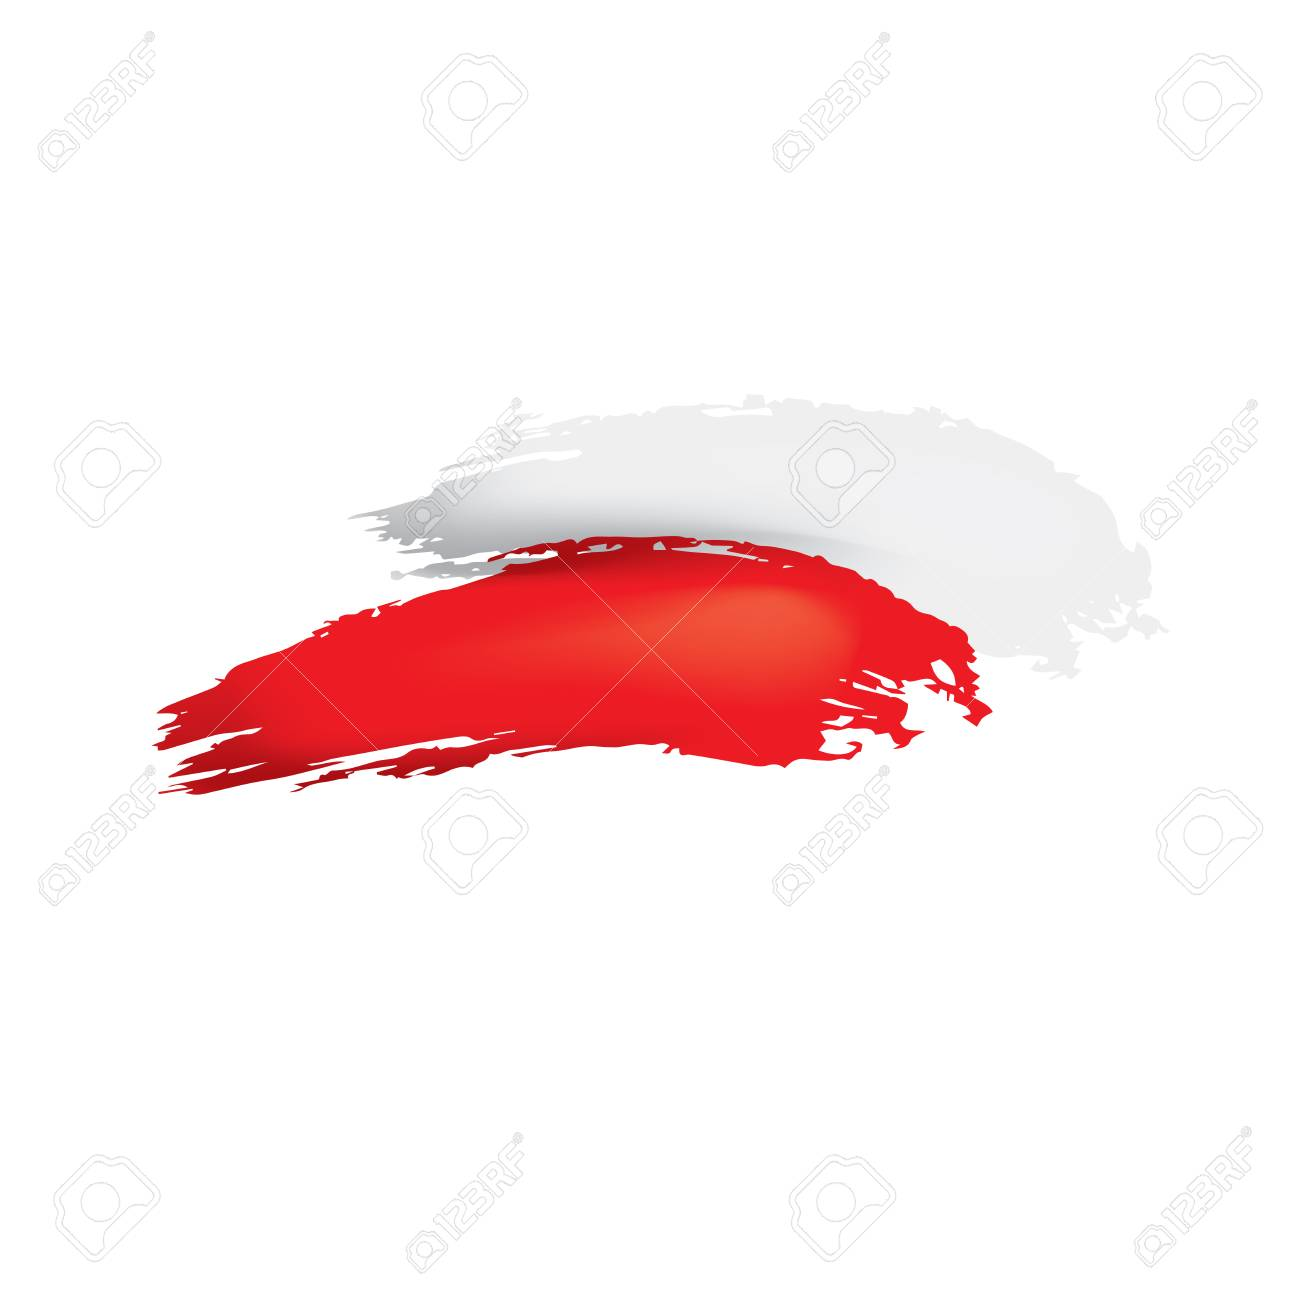 Poland flag, vector illustration on a white background. - 107842303